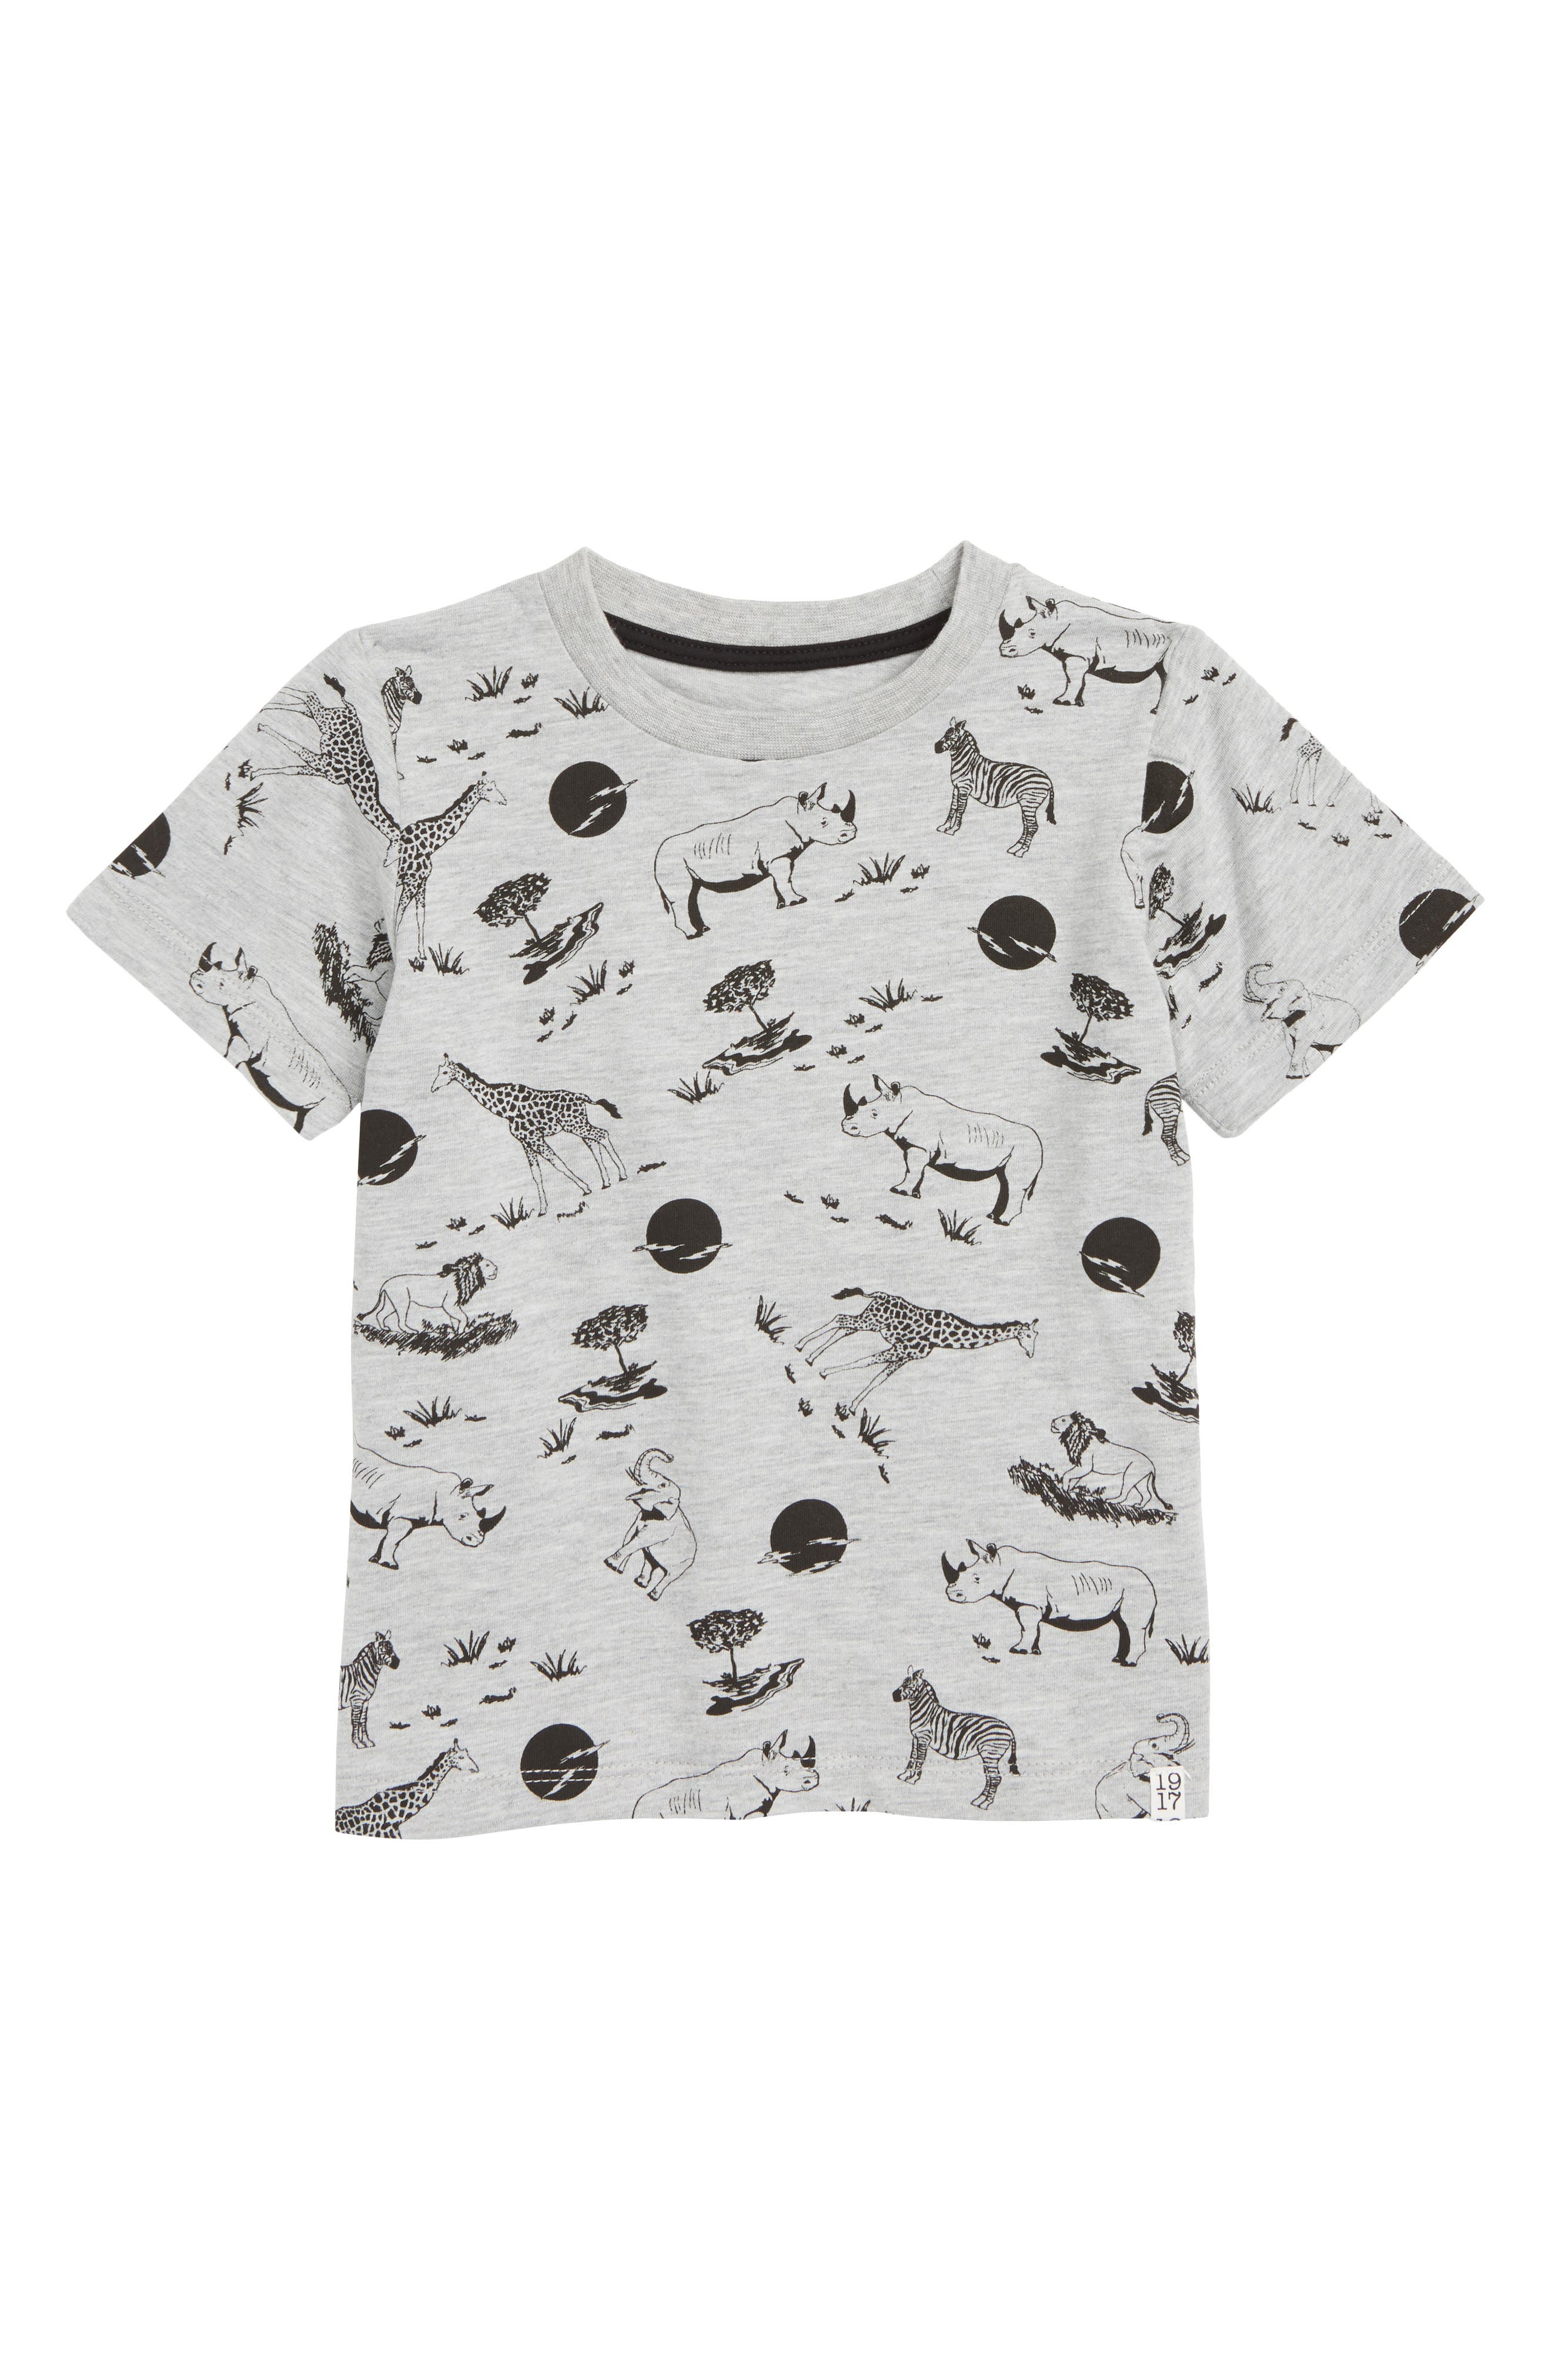 Loy T-Shirt,                             Main thumbnail 1, color,                             SAFARI COLOR